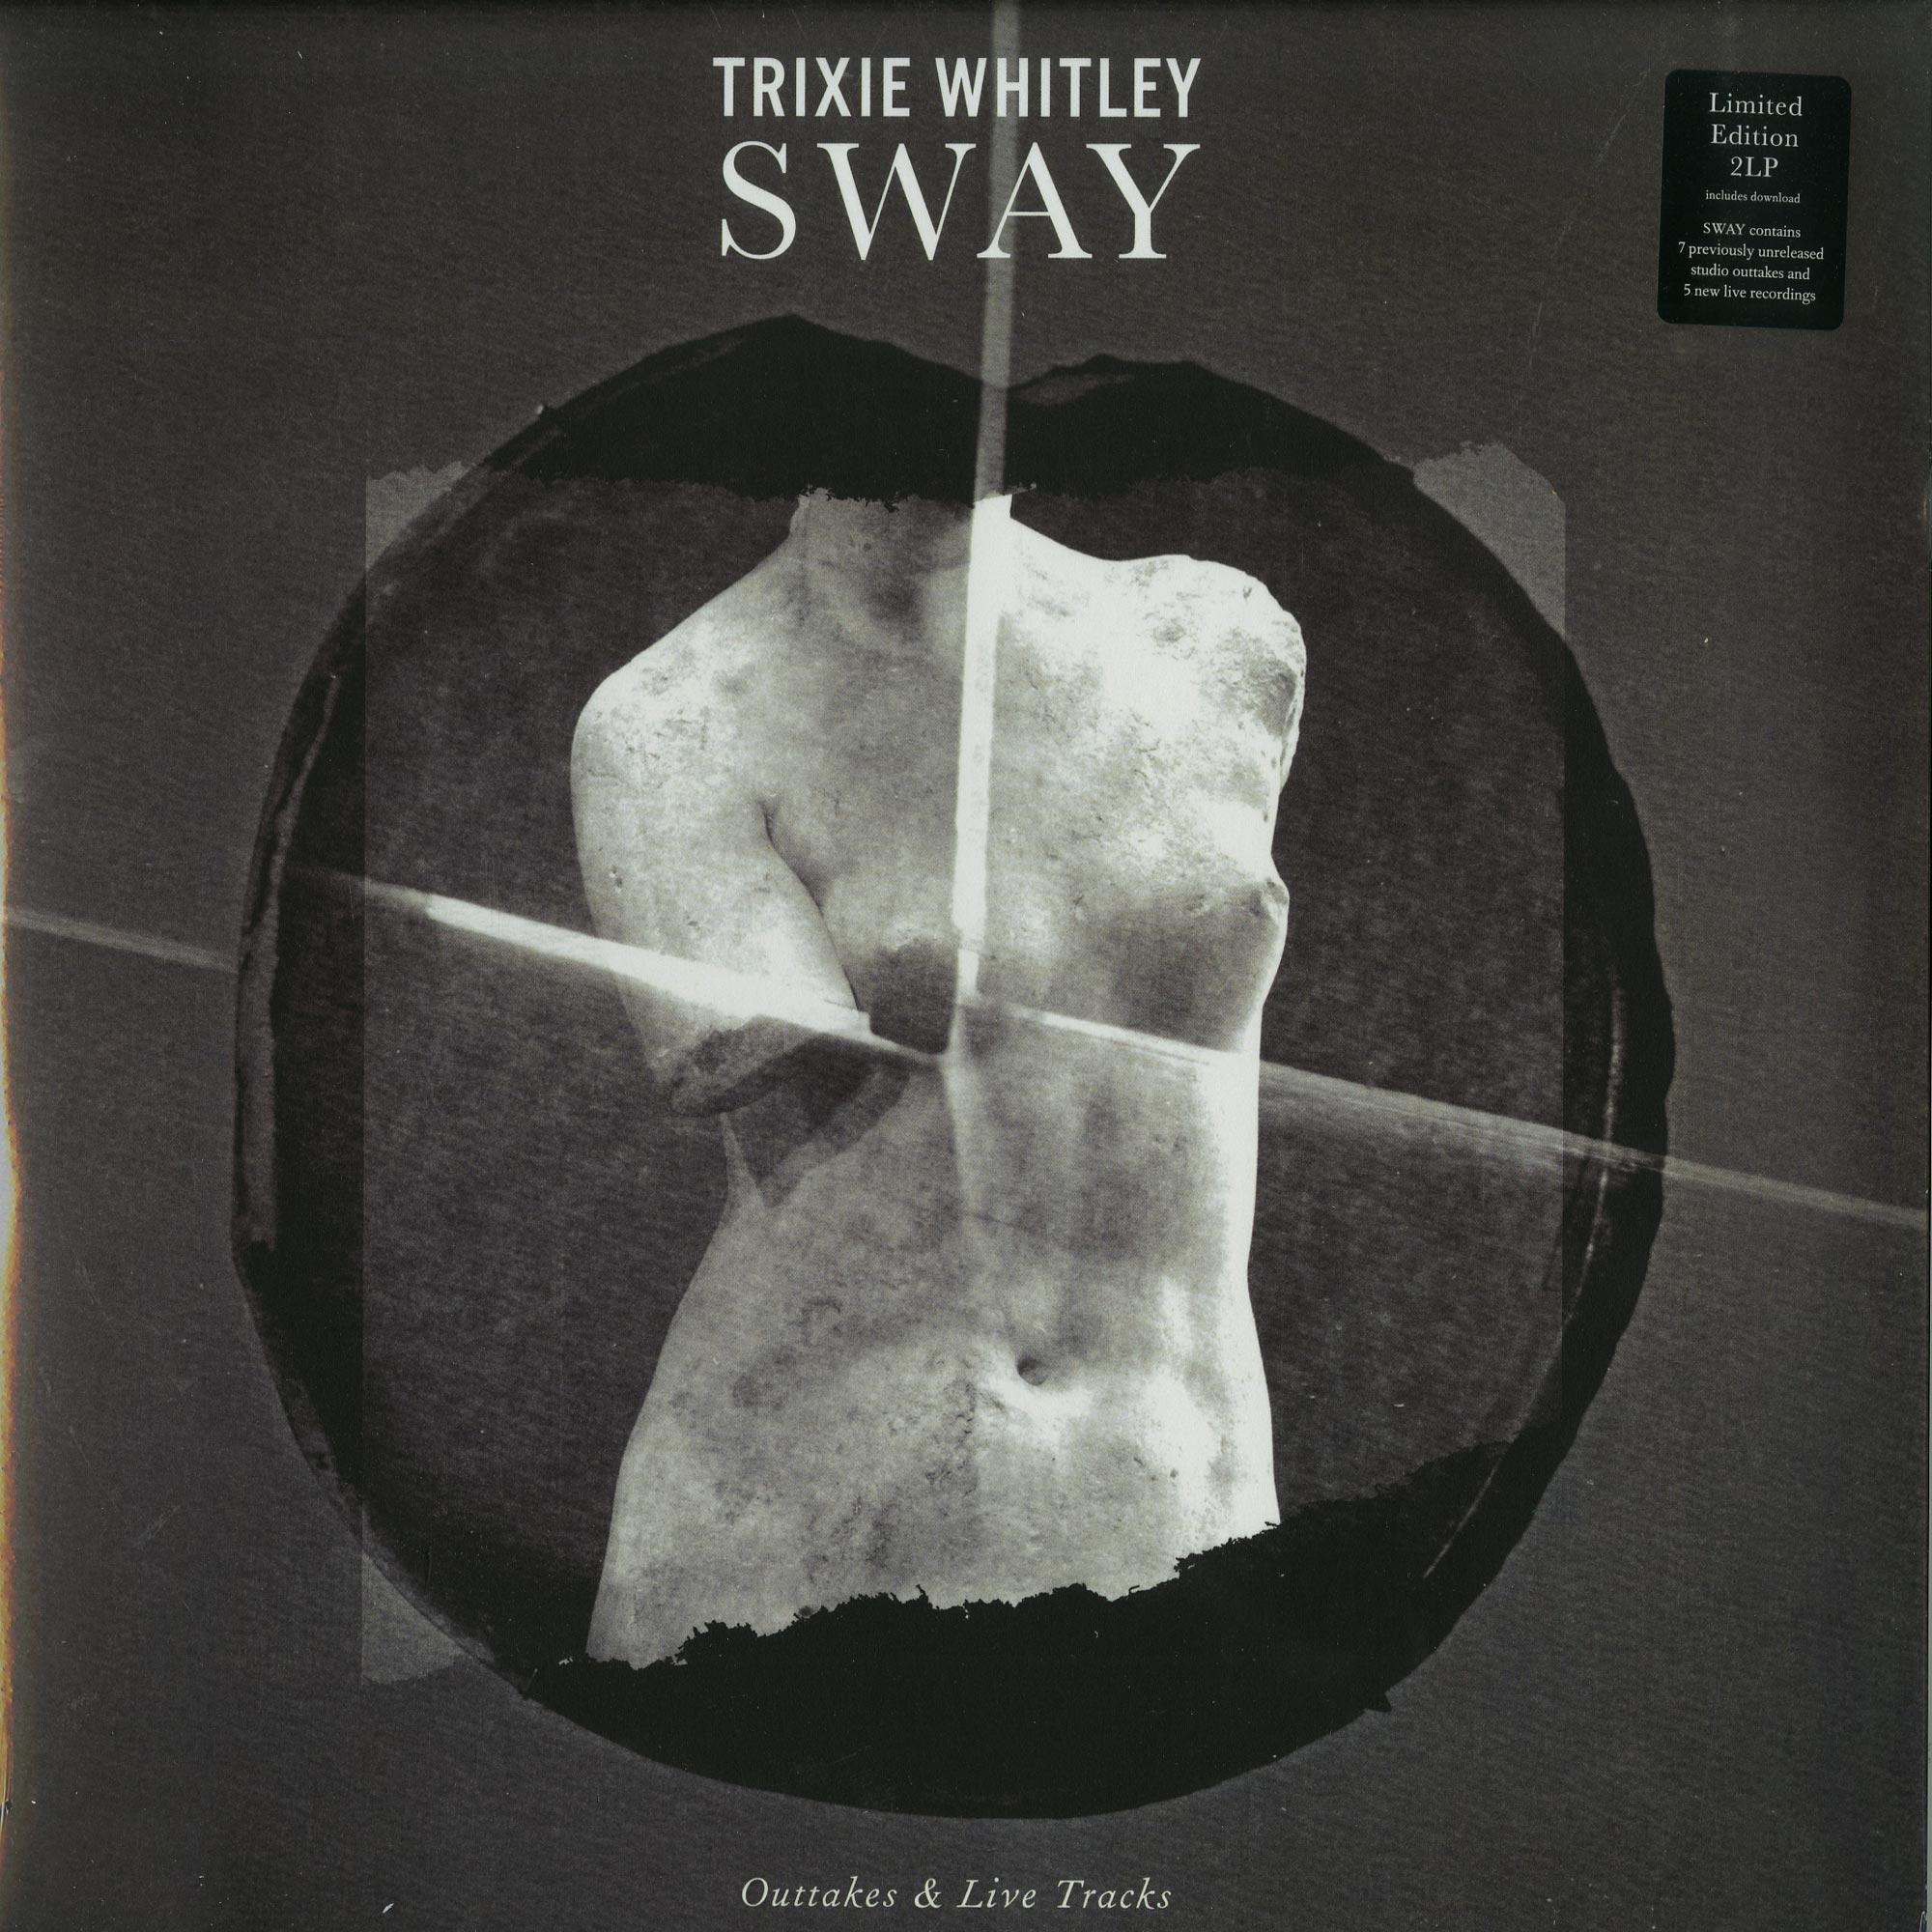 Trixie Whitley - SWAY